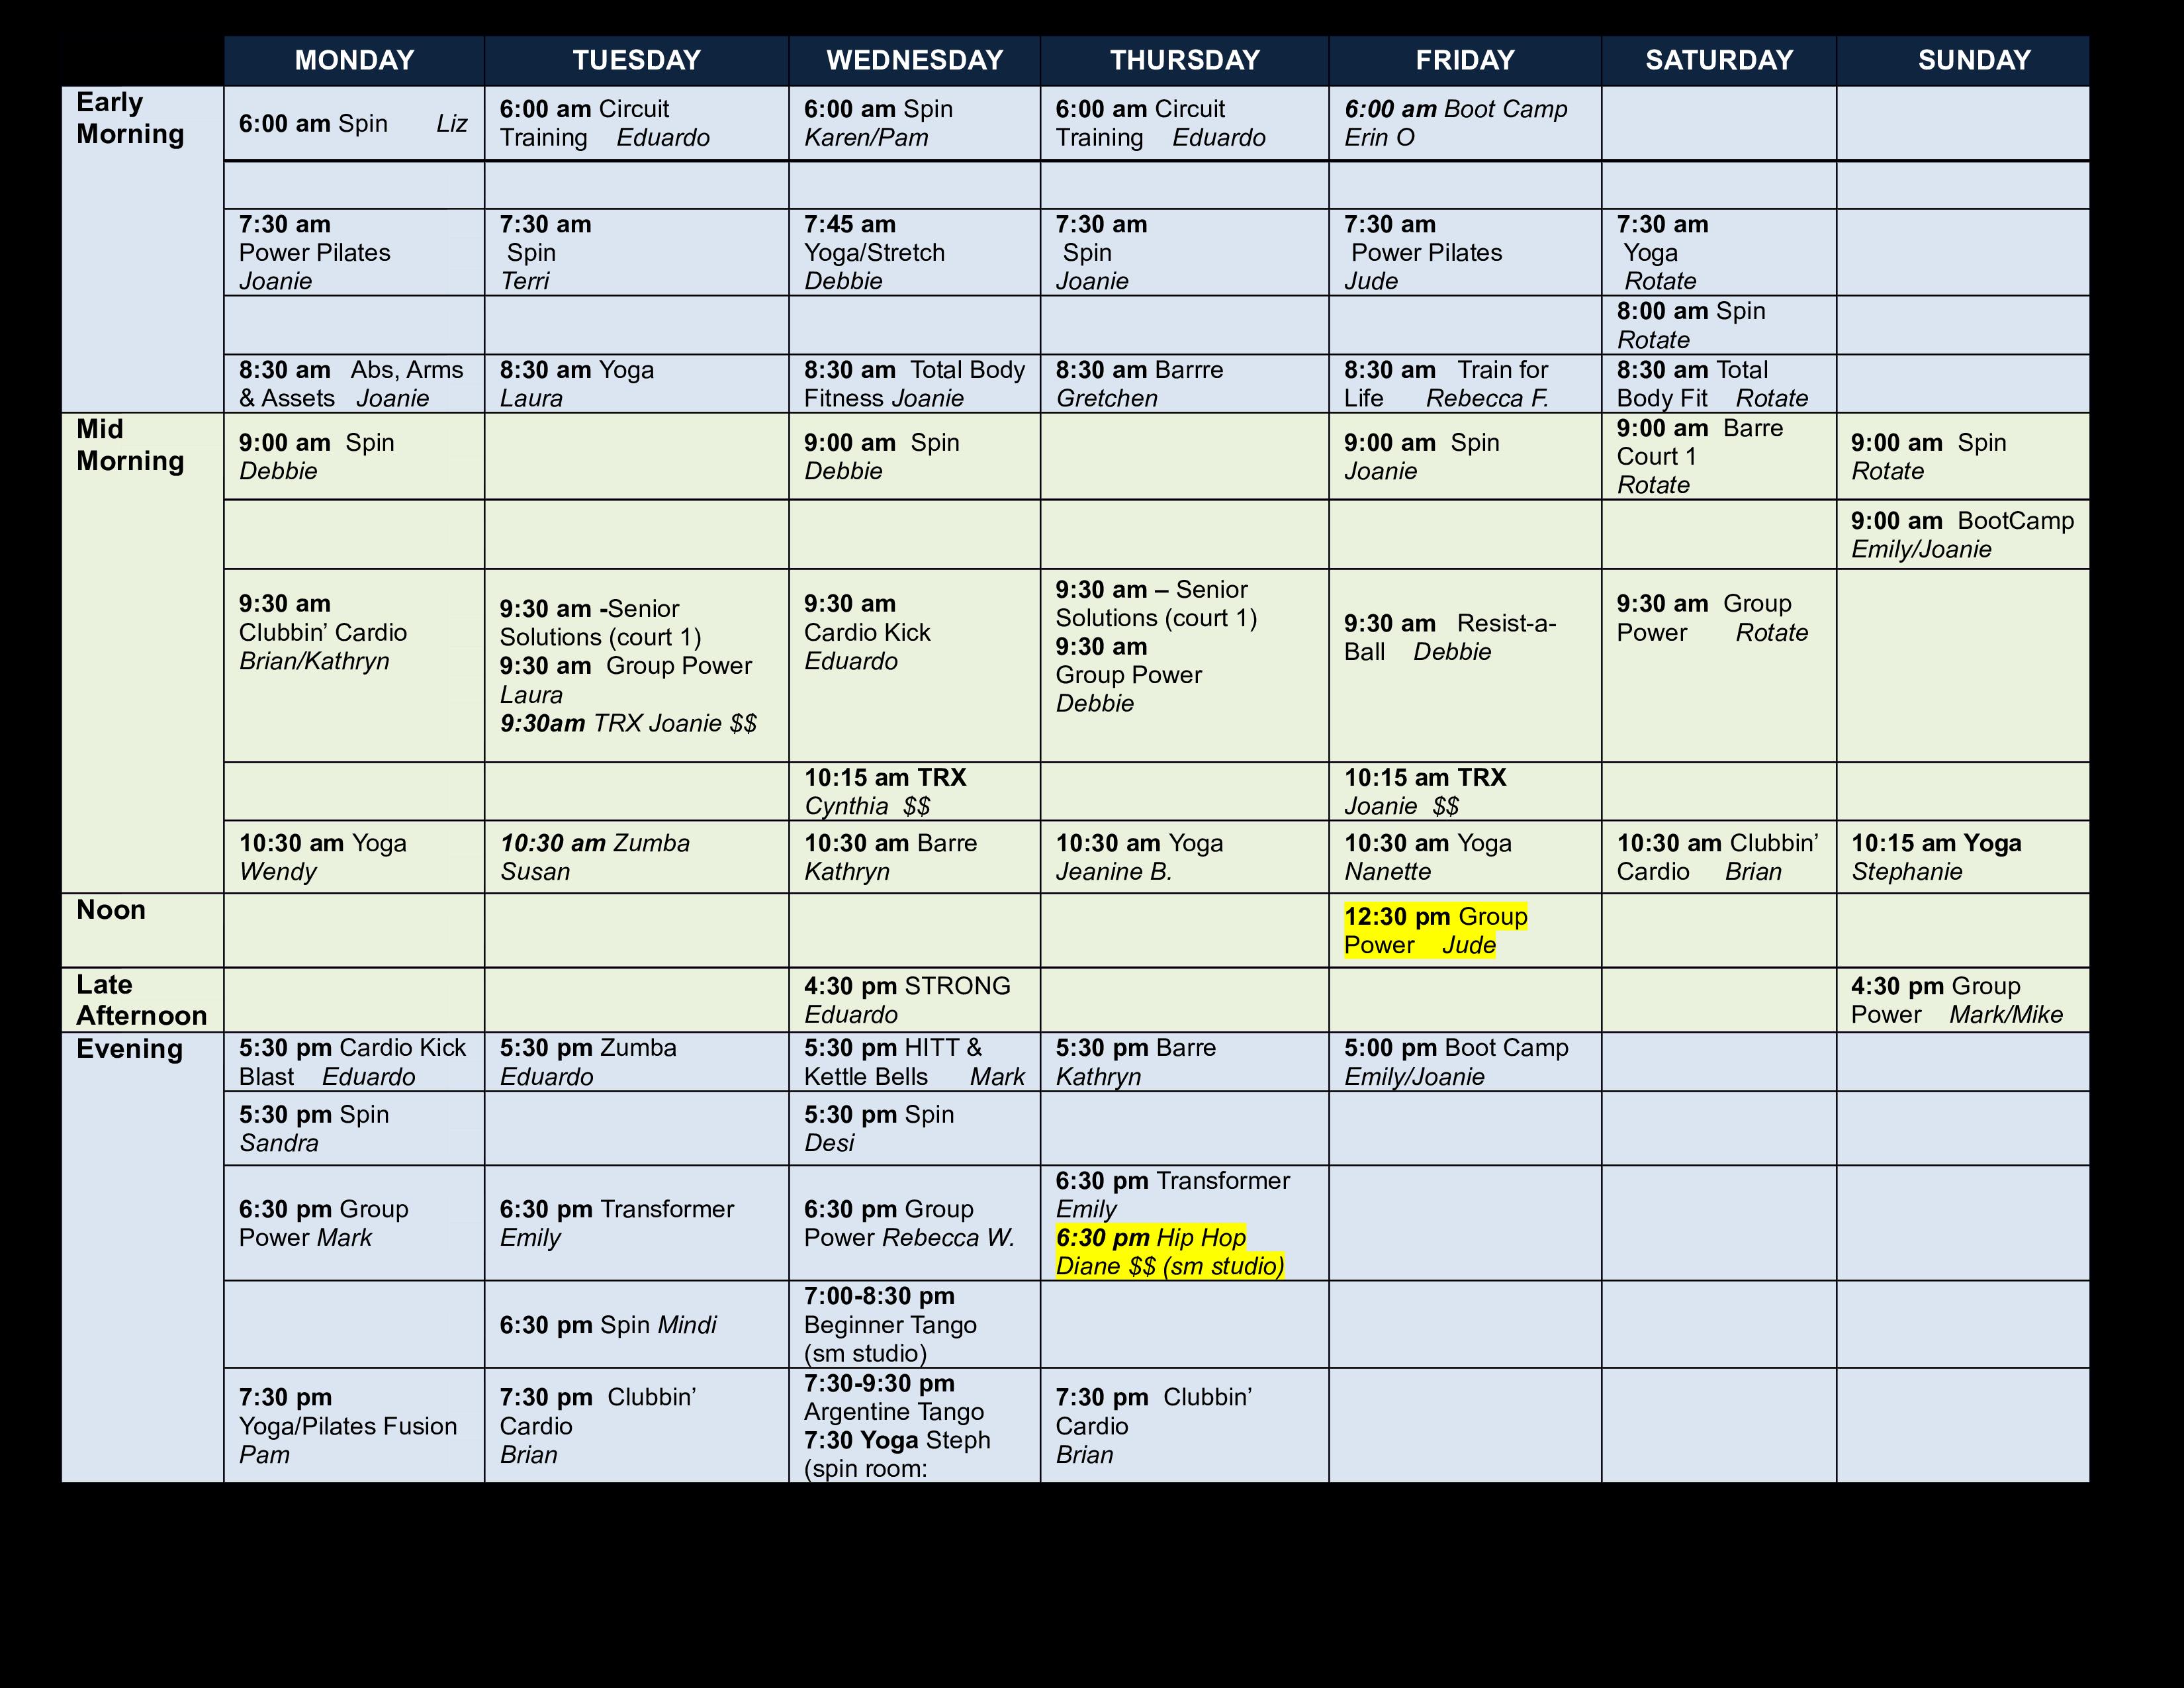 Free Group Fitness Calendar Templates At Allbusinesstemplates